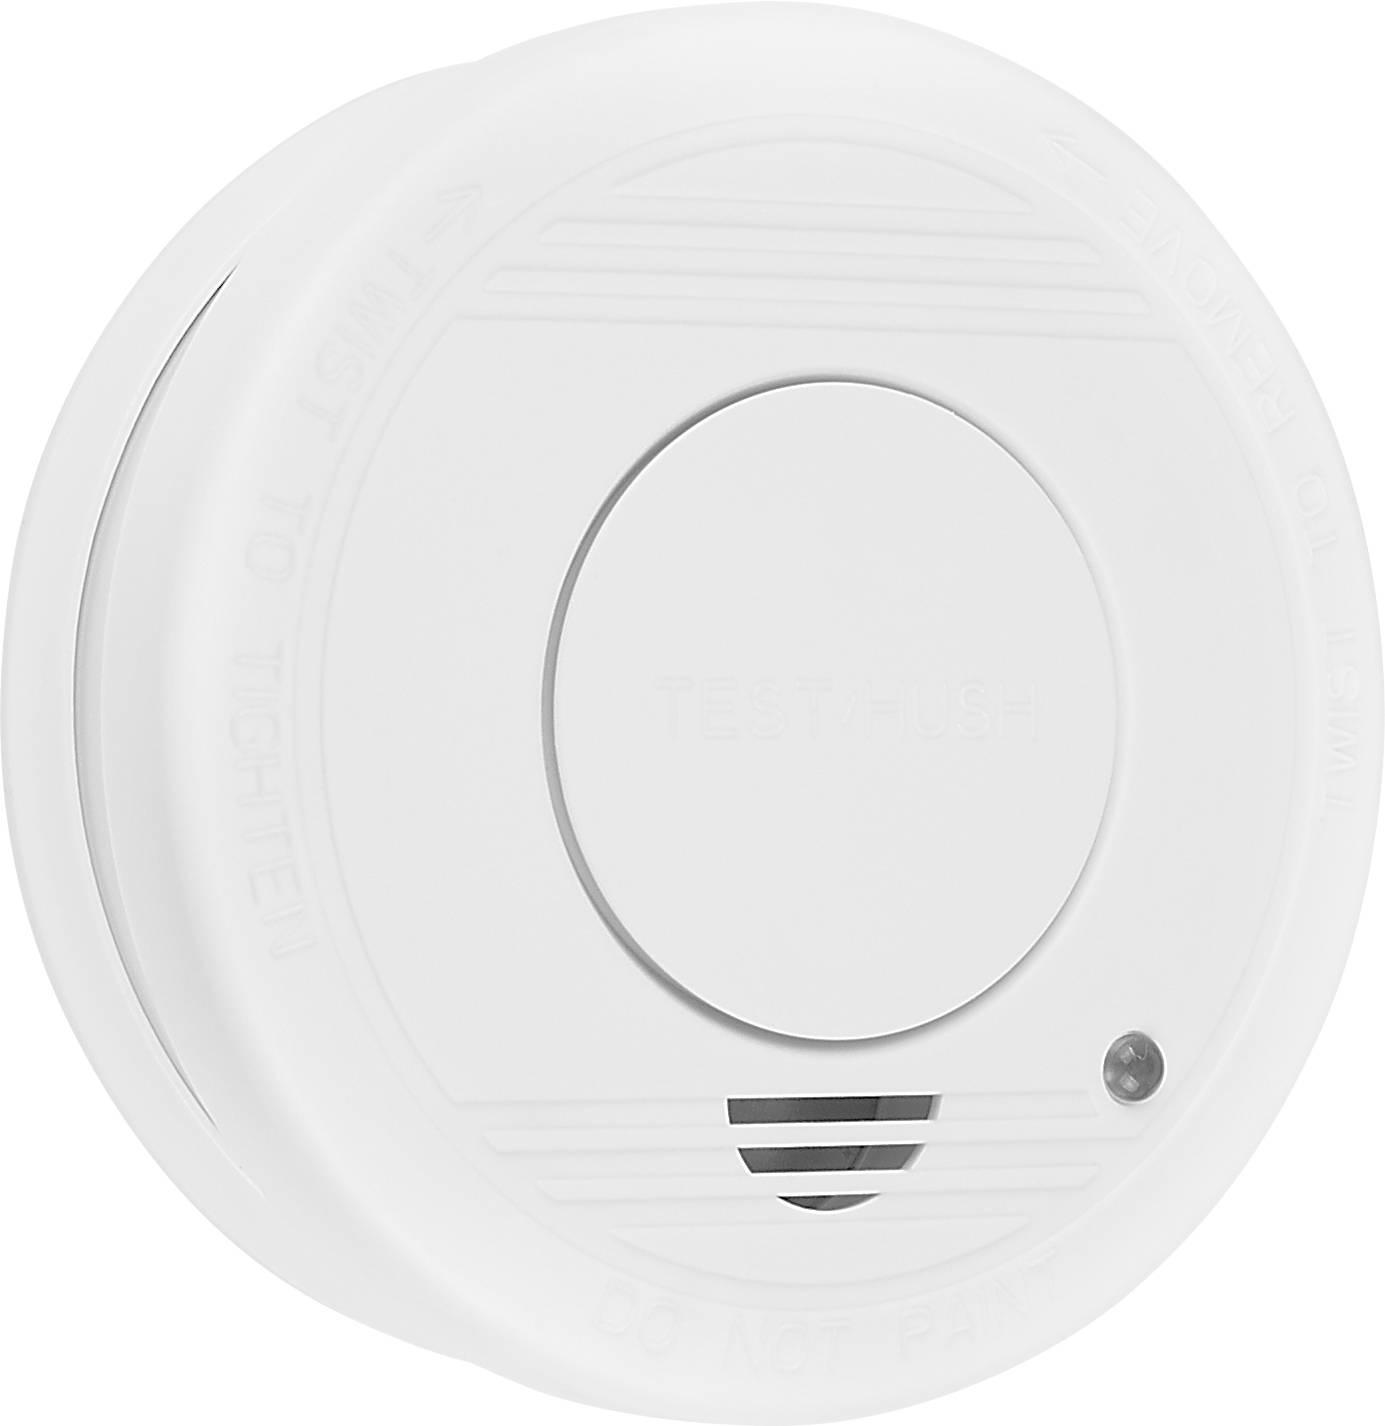 Detektor kouře Smartwares RM250 10.044.62, na baterii